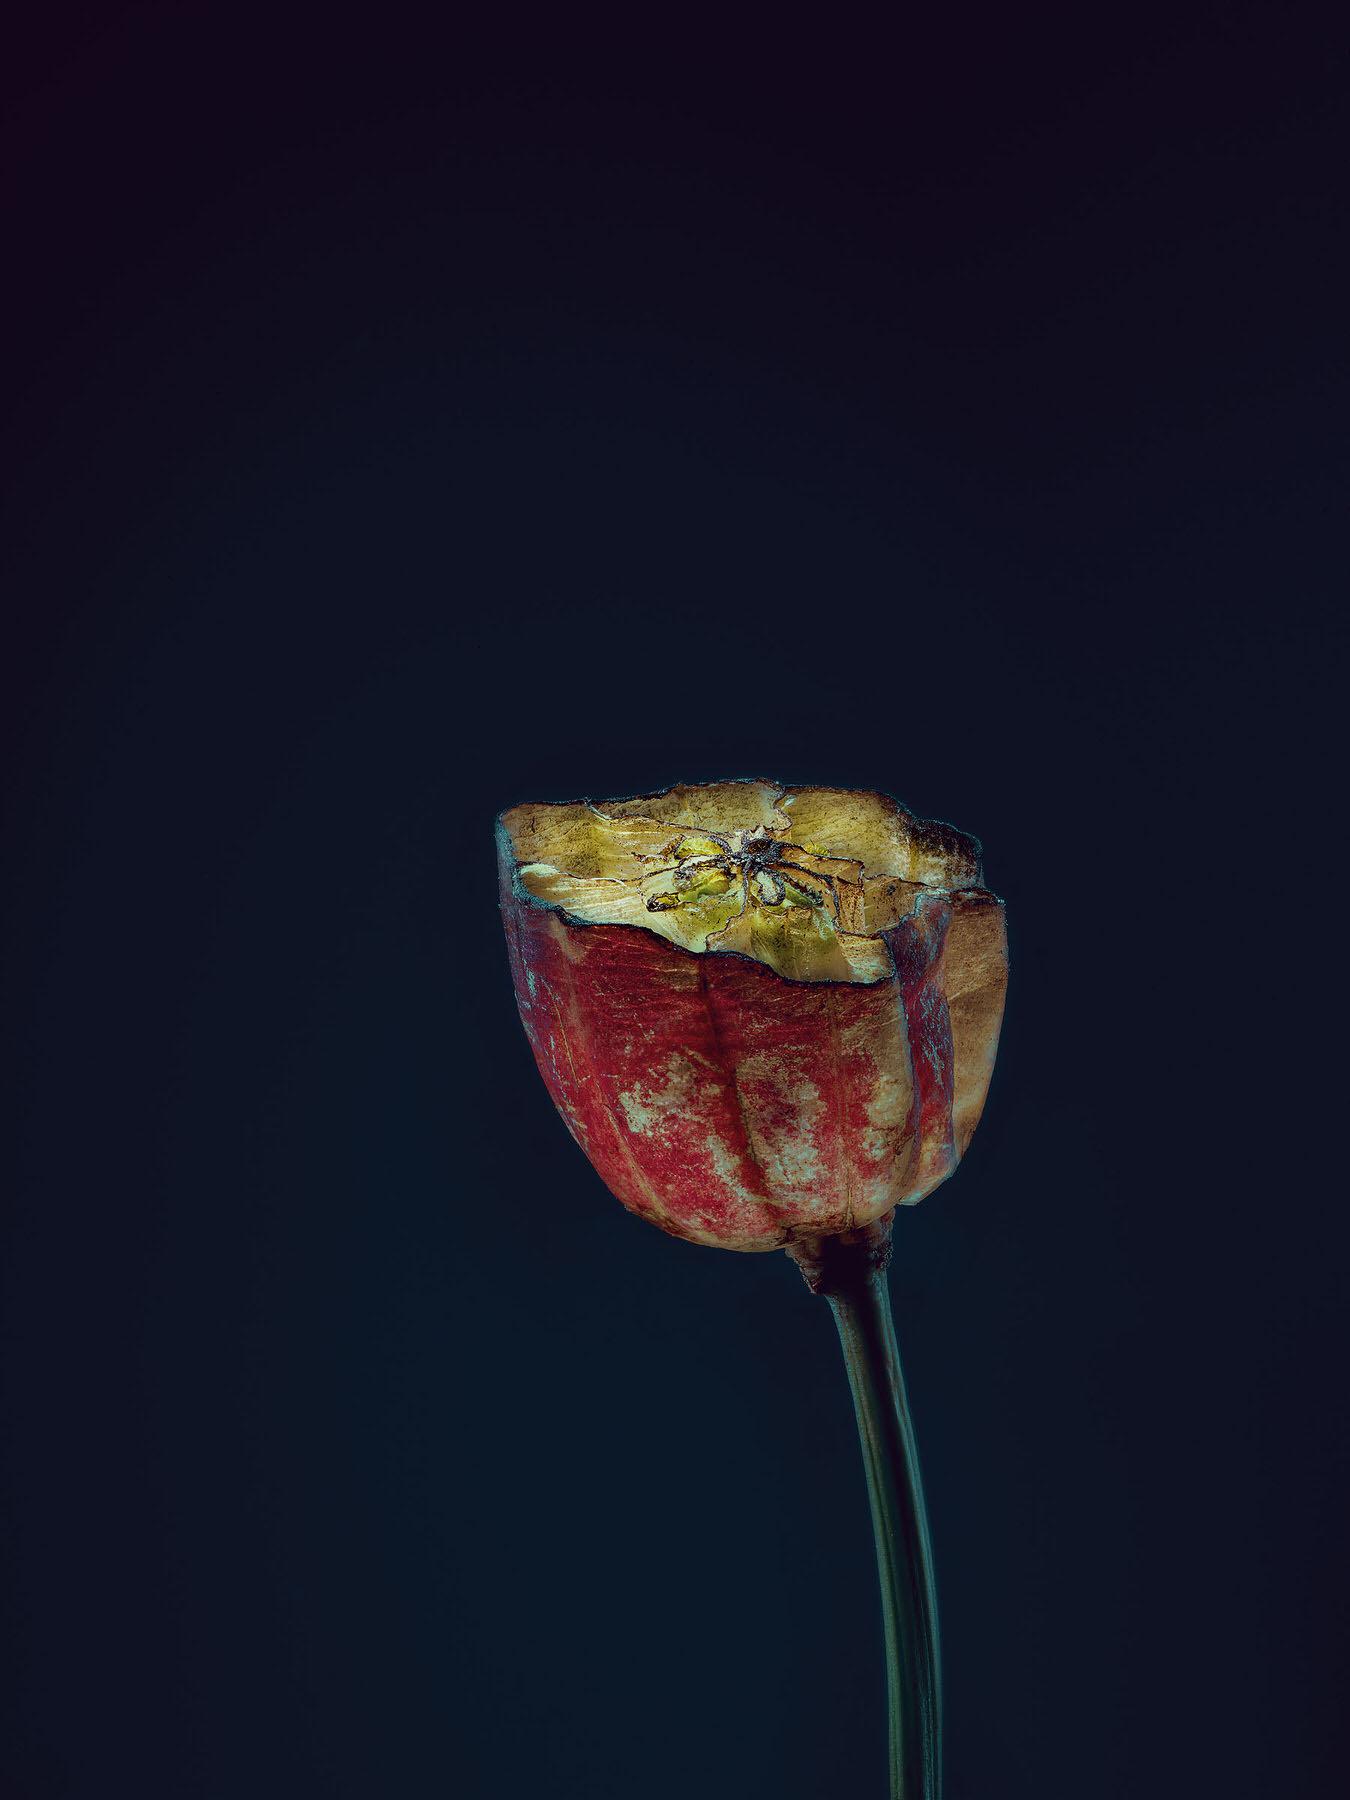 Simon_Puschmann_assaulted-flowers_nigella_damascena.jpg